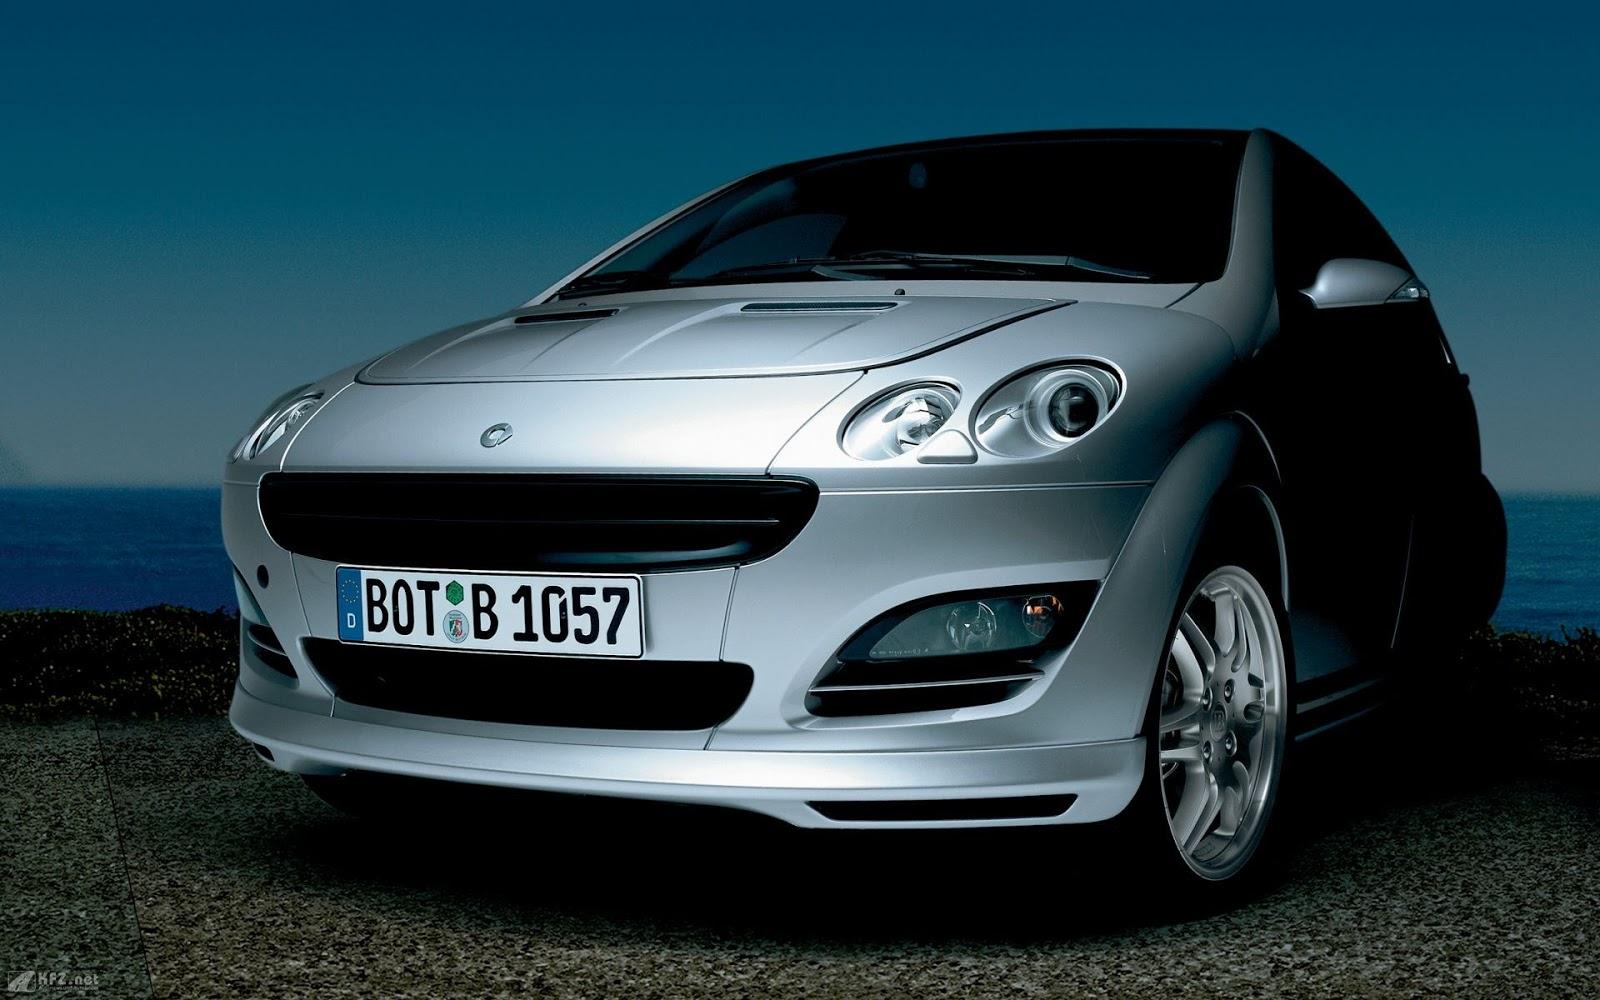 ... ultra model sets imgchili sierra model set 14 imgchili Car Tuning